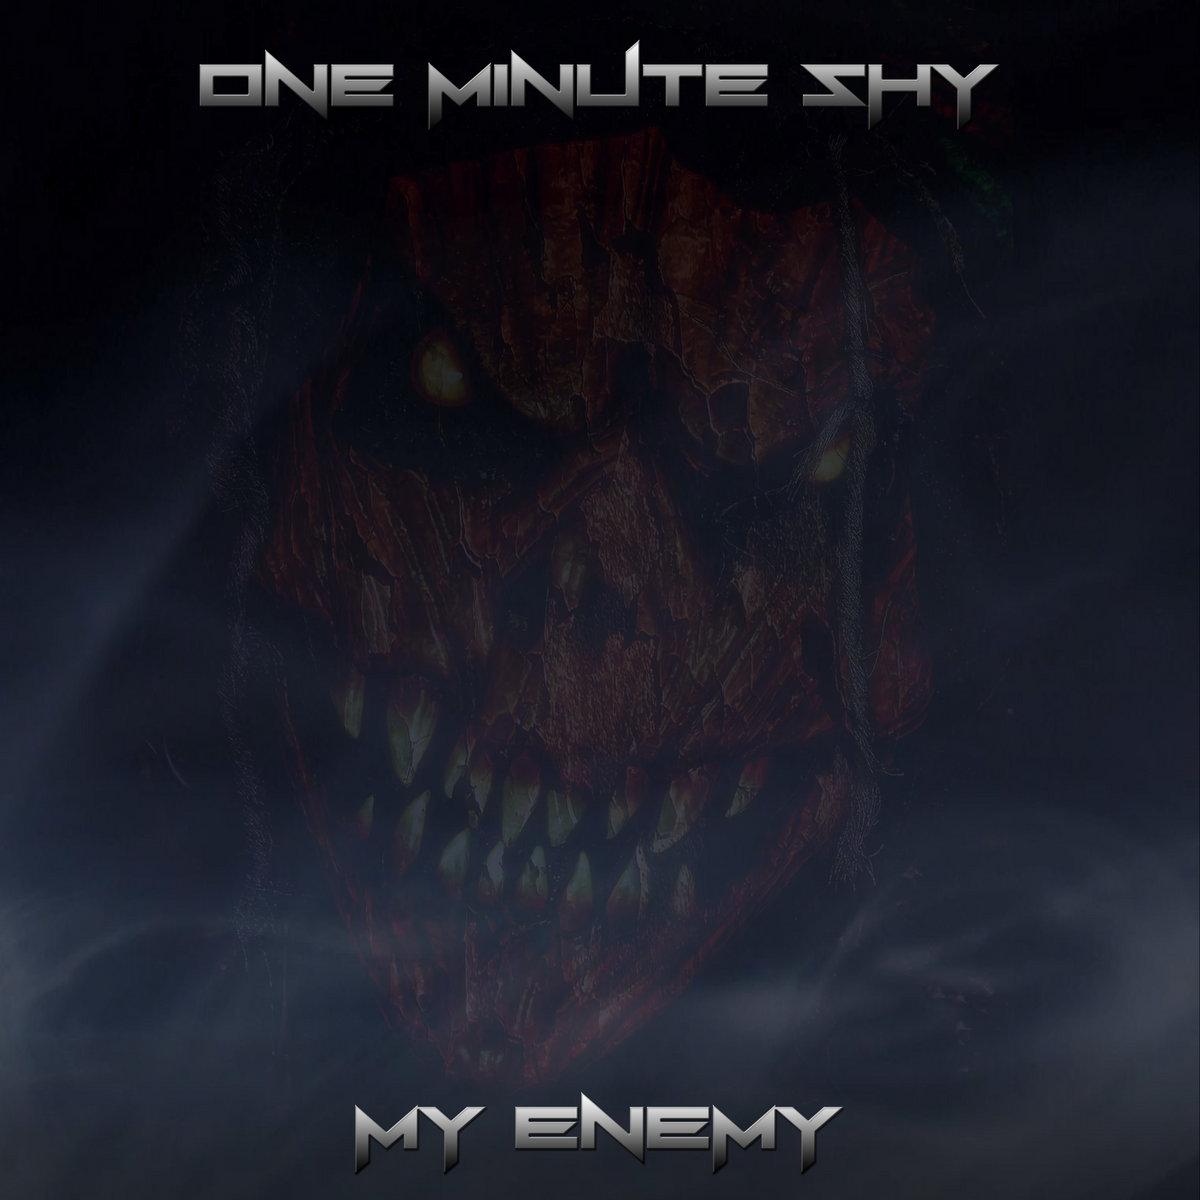 www.facebook.com/oneminuteshy